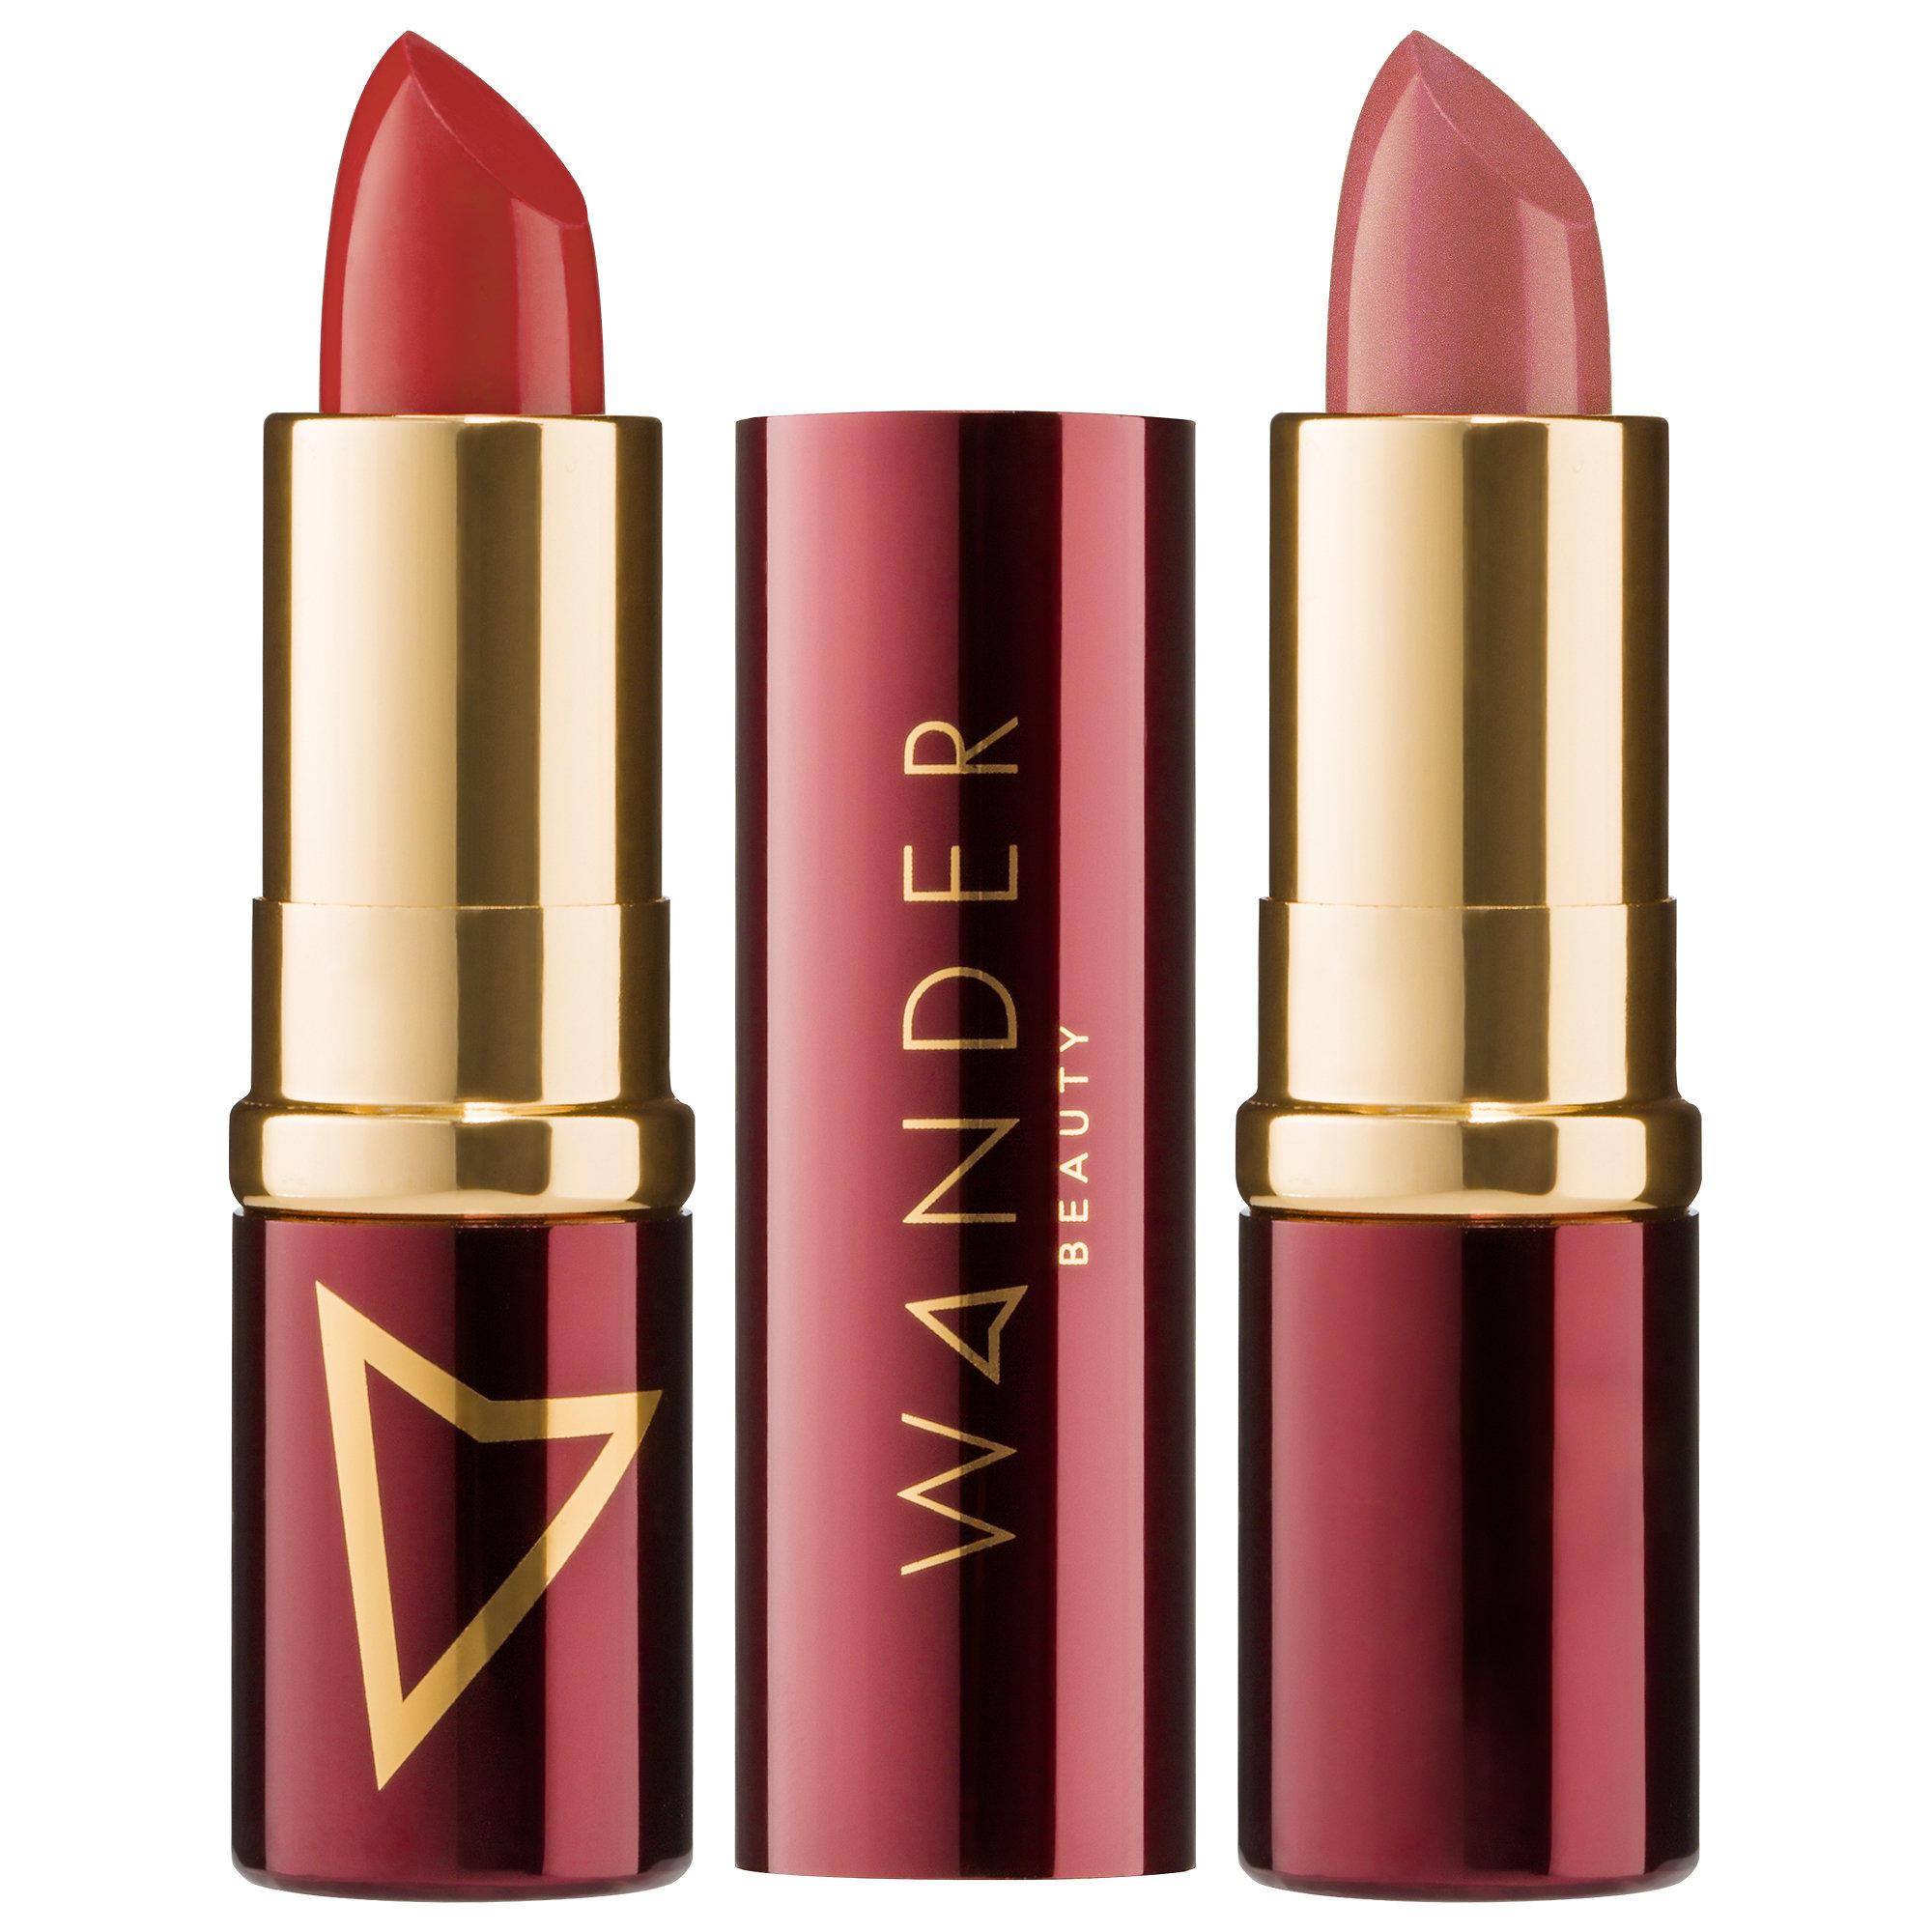 Wander Beauty Wanderout Dual Lipsticks Wanderberry / Barely There